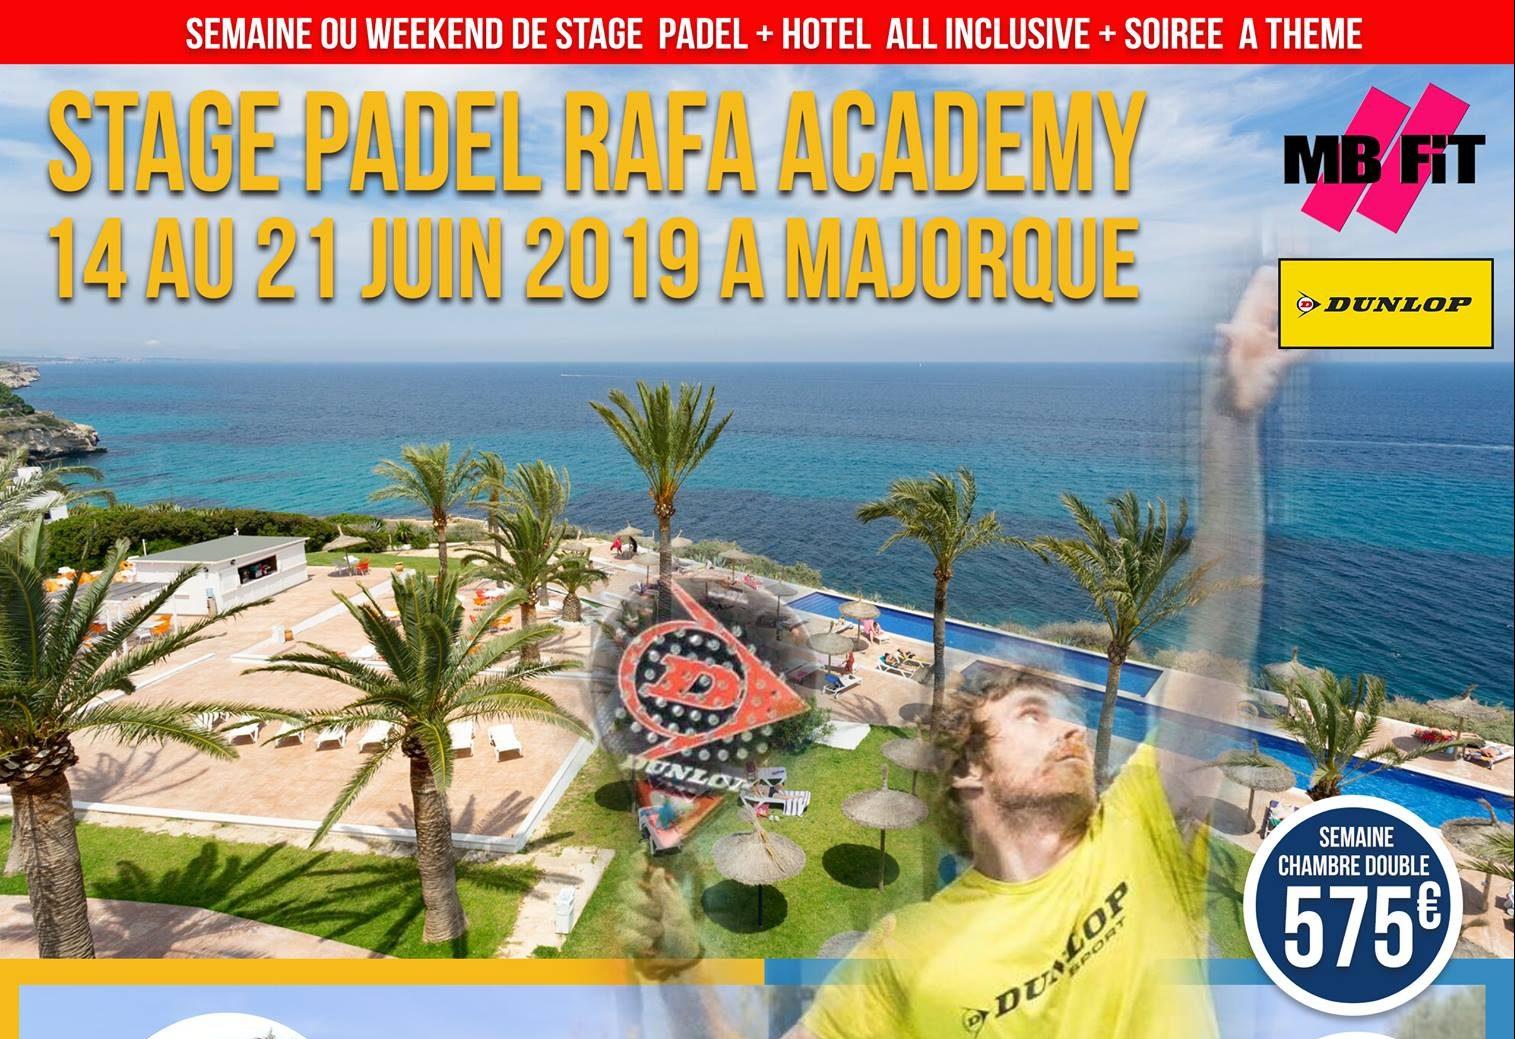 Padelskurs på Mallorca: all inclusive av 14 på 21 juni.